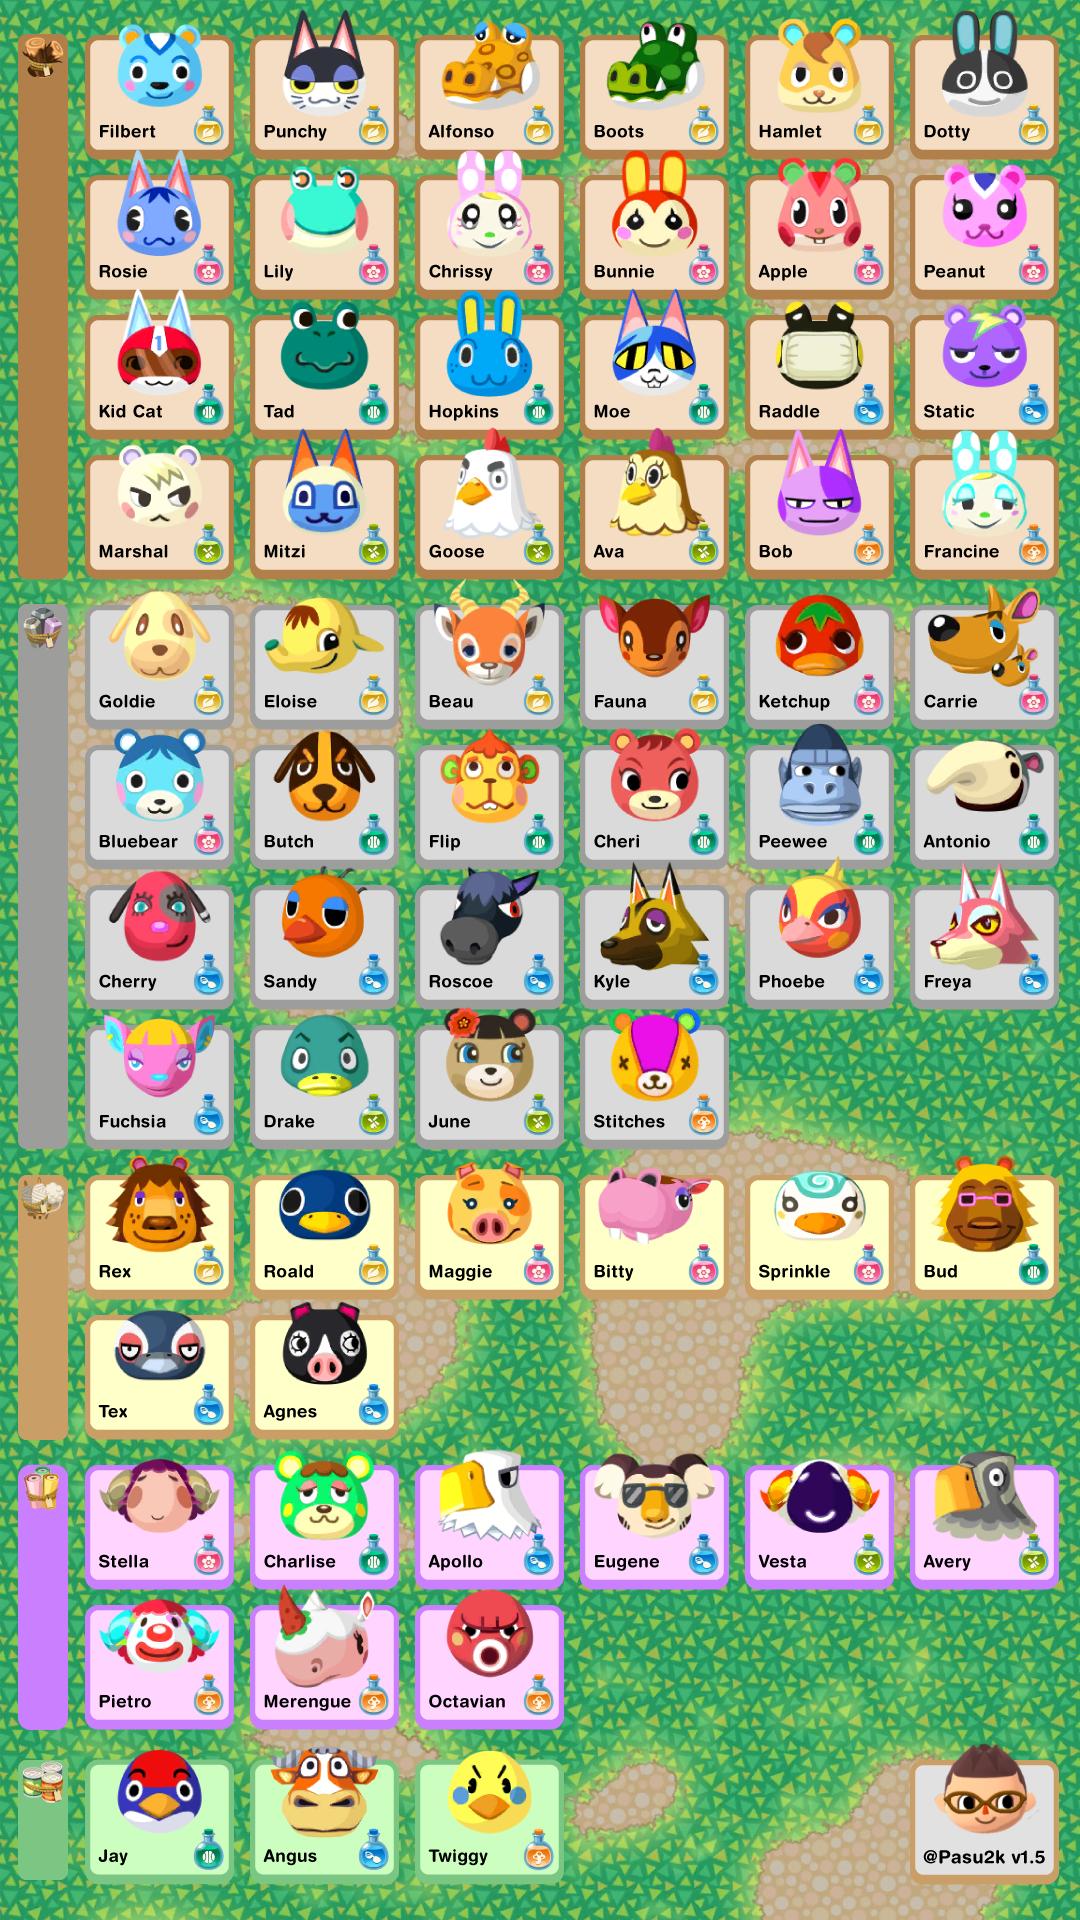 Pin By Tiffany Bittencourt Silva On Gaming Animal Crossing Pocket Camp Animal Crossing Animal Crossing Pc